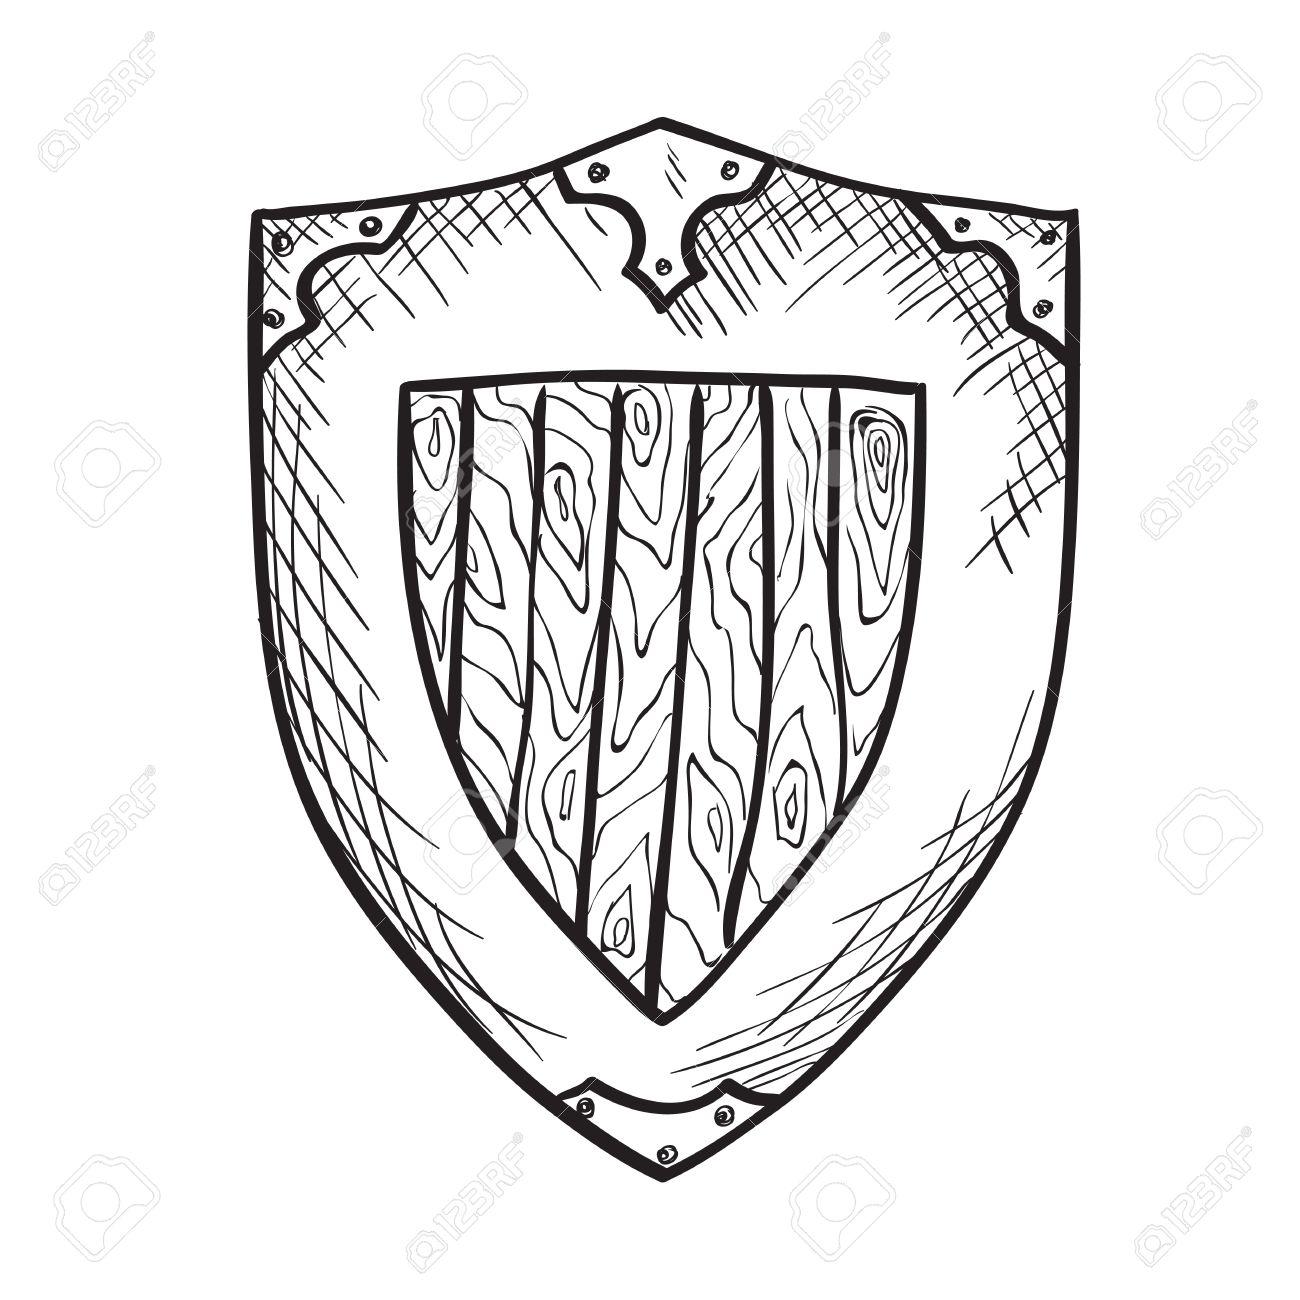 1300x1300 Hand Drawn Sketch Medieval Shield, Ink Drawing Imitation Royalty